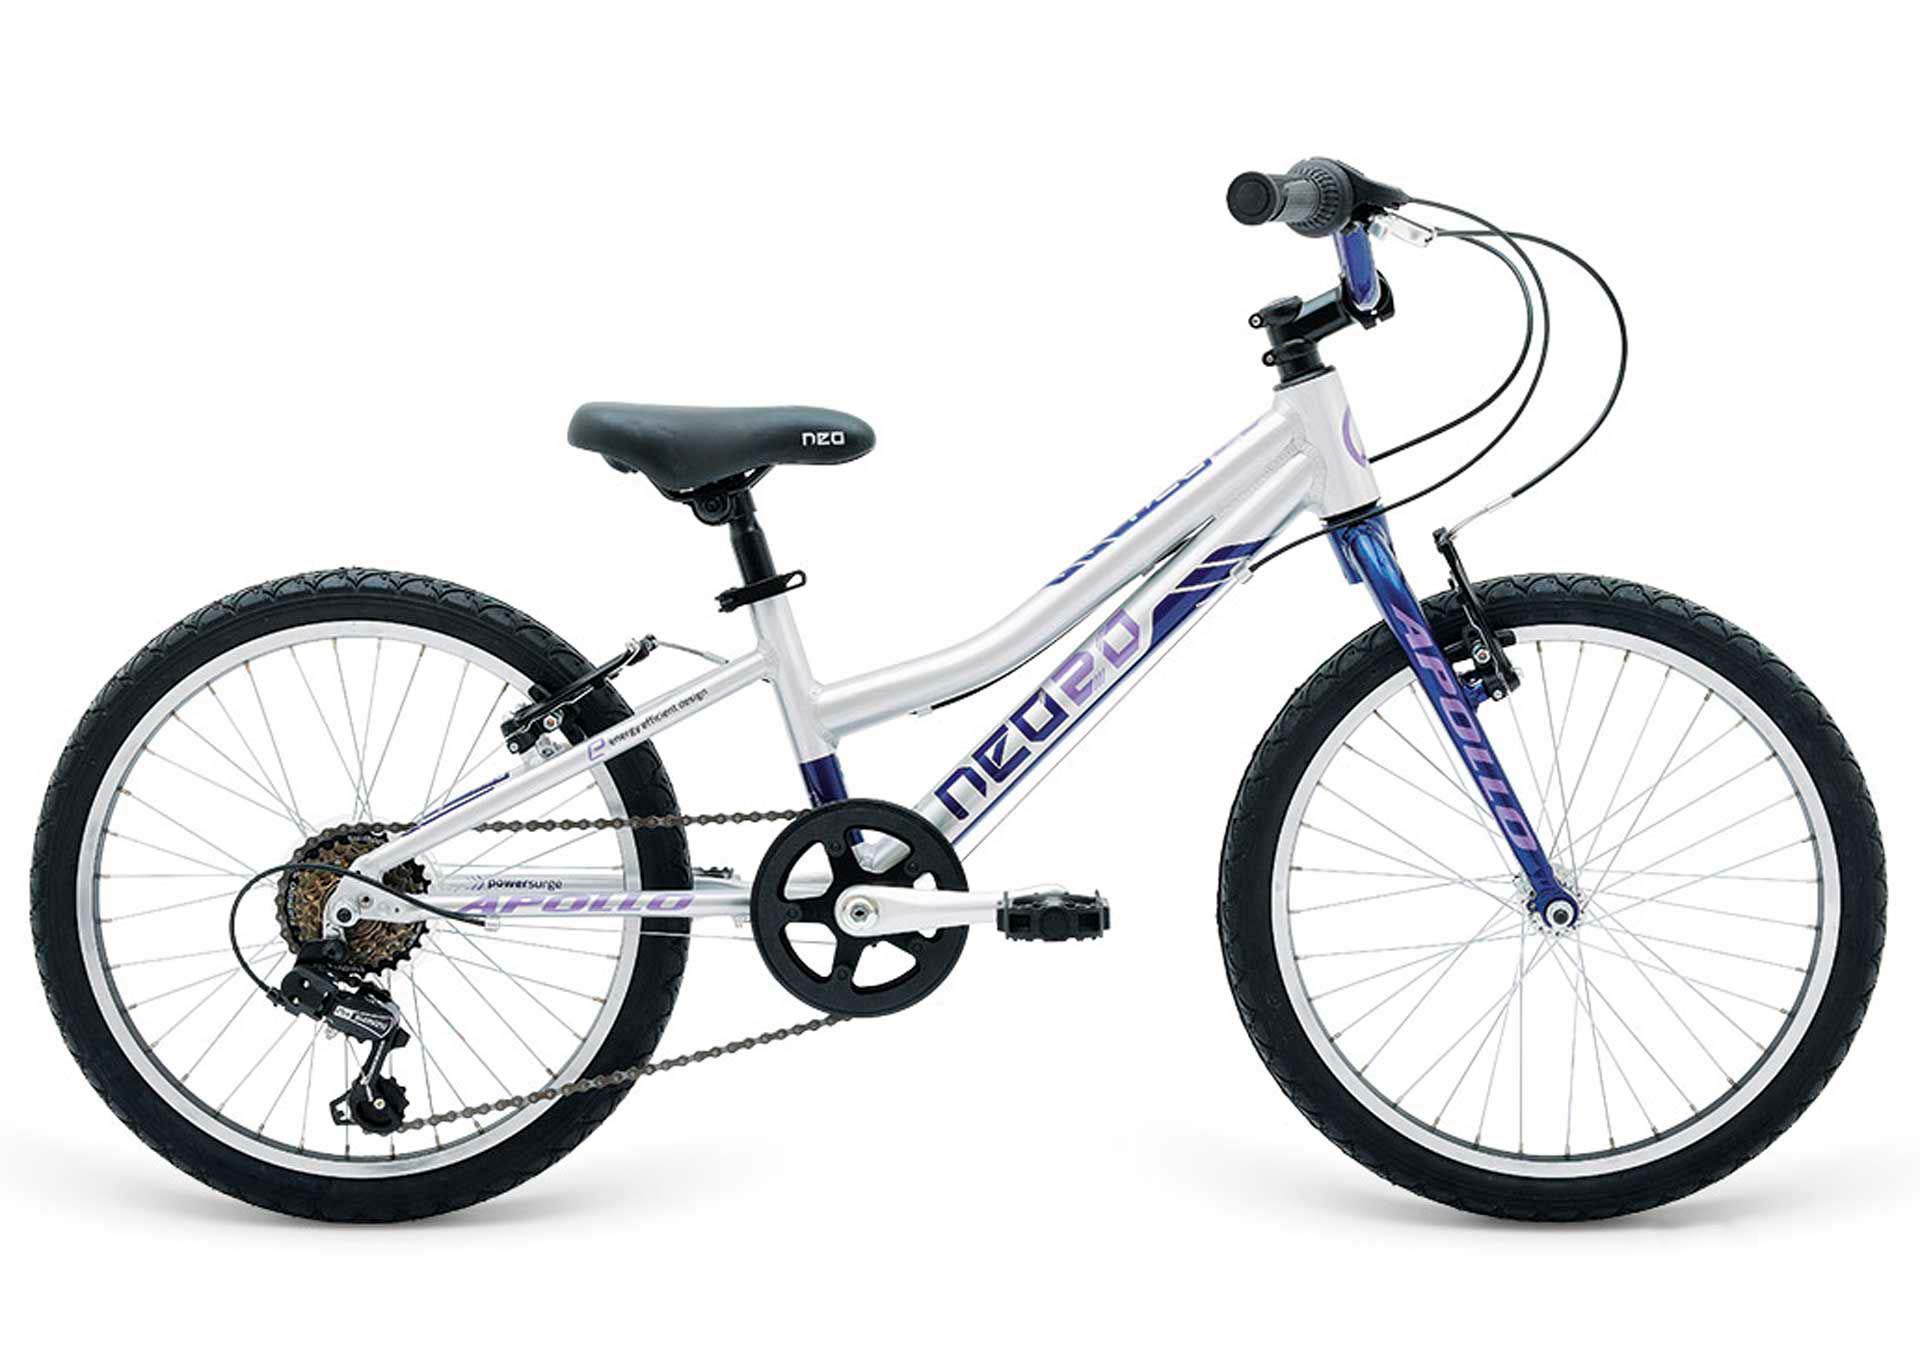 Велосипед 20 Apollo Neo 6s girls синий/сиреневый 2018